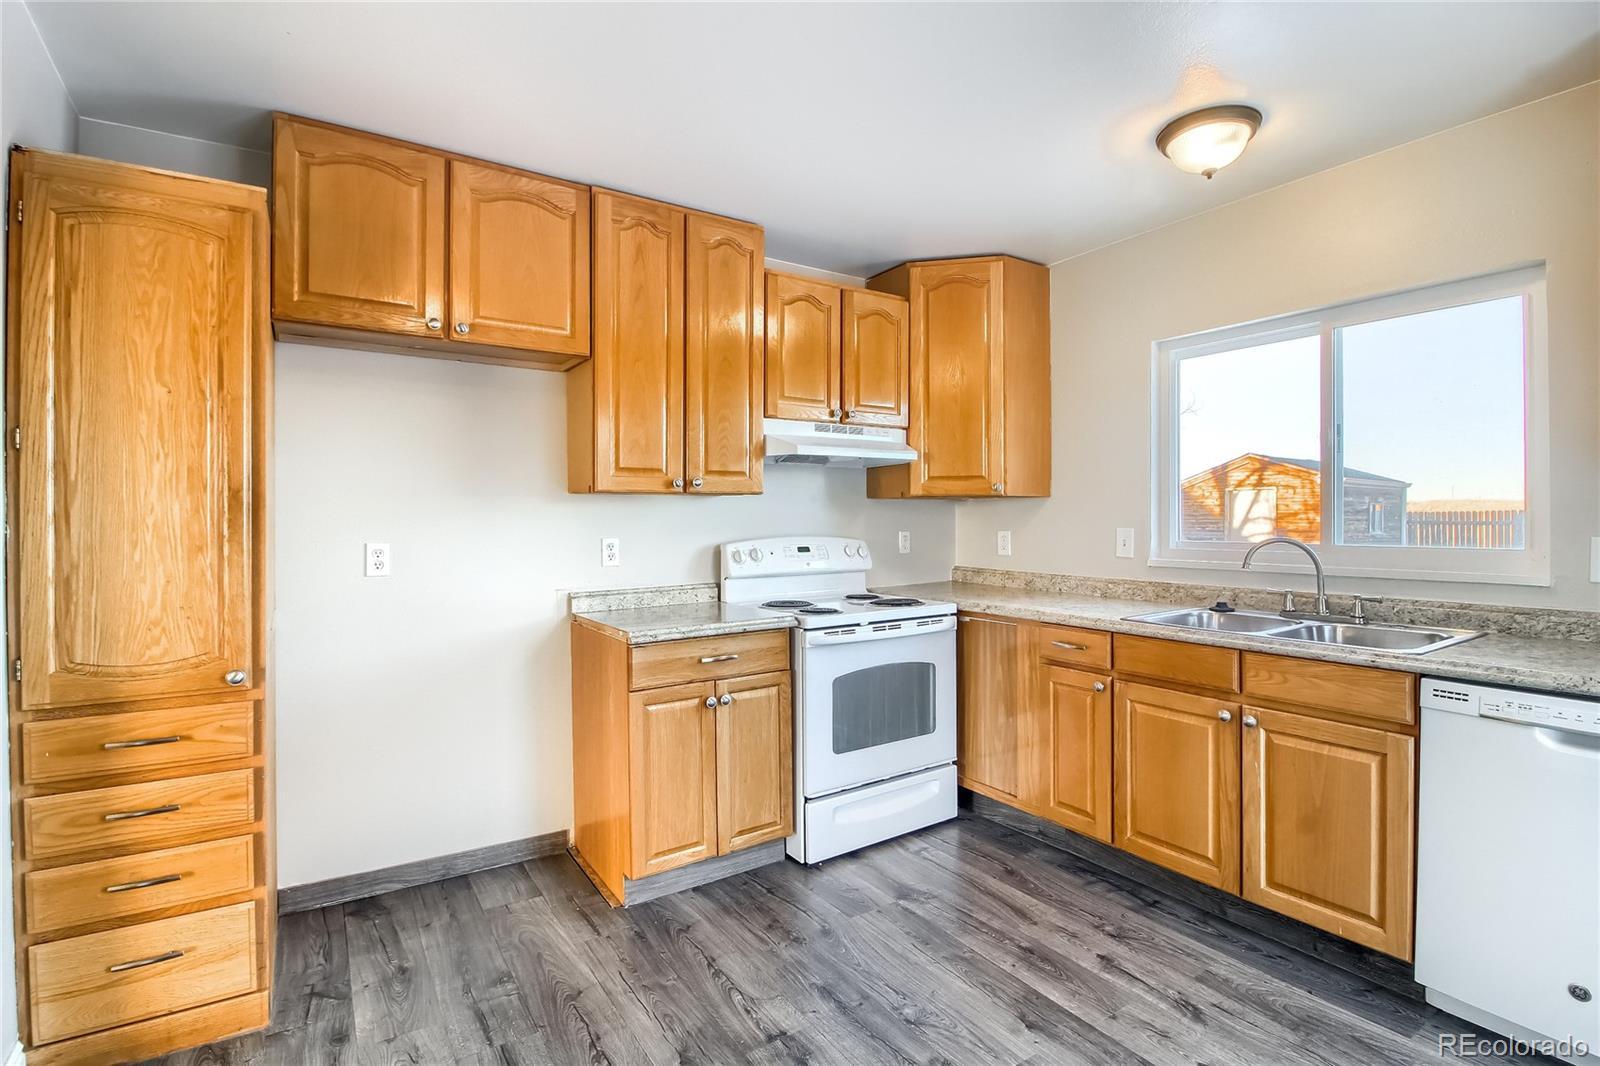 MLS# 8804701 - 9 - 20615 E Coolidge Place, Aurora, CO 80011